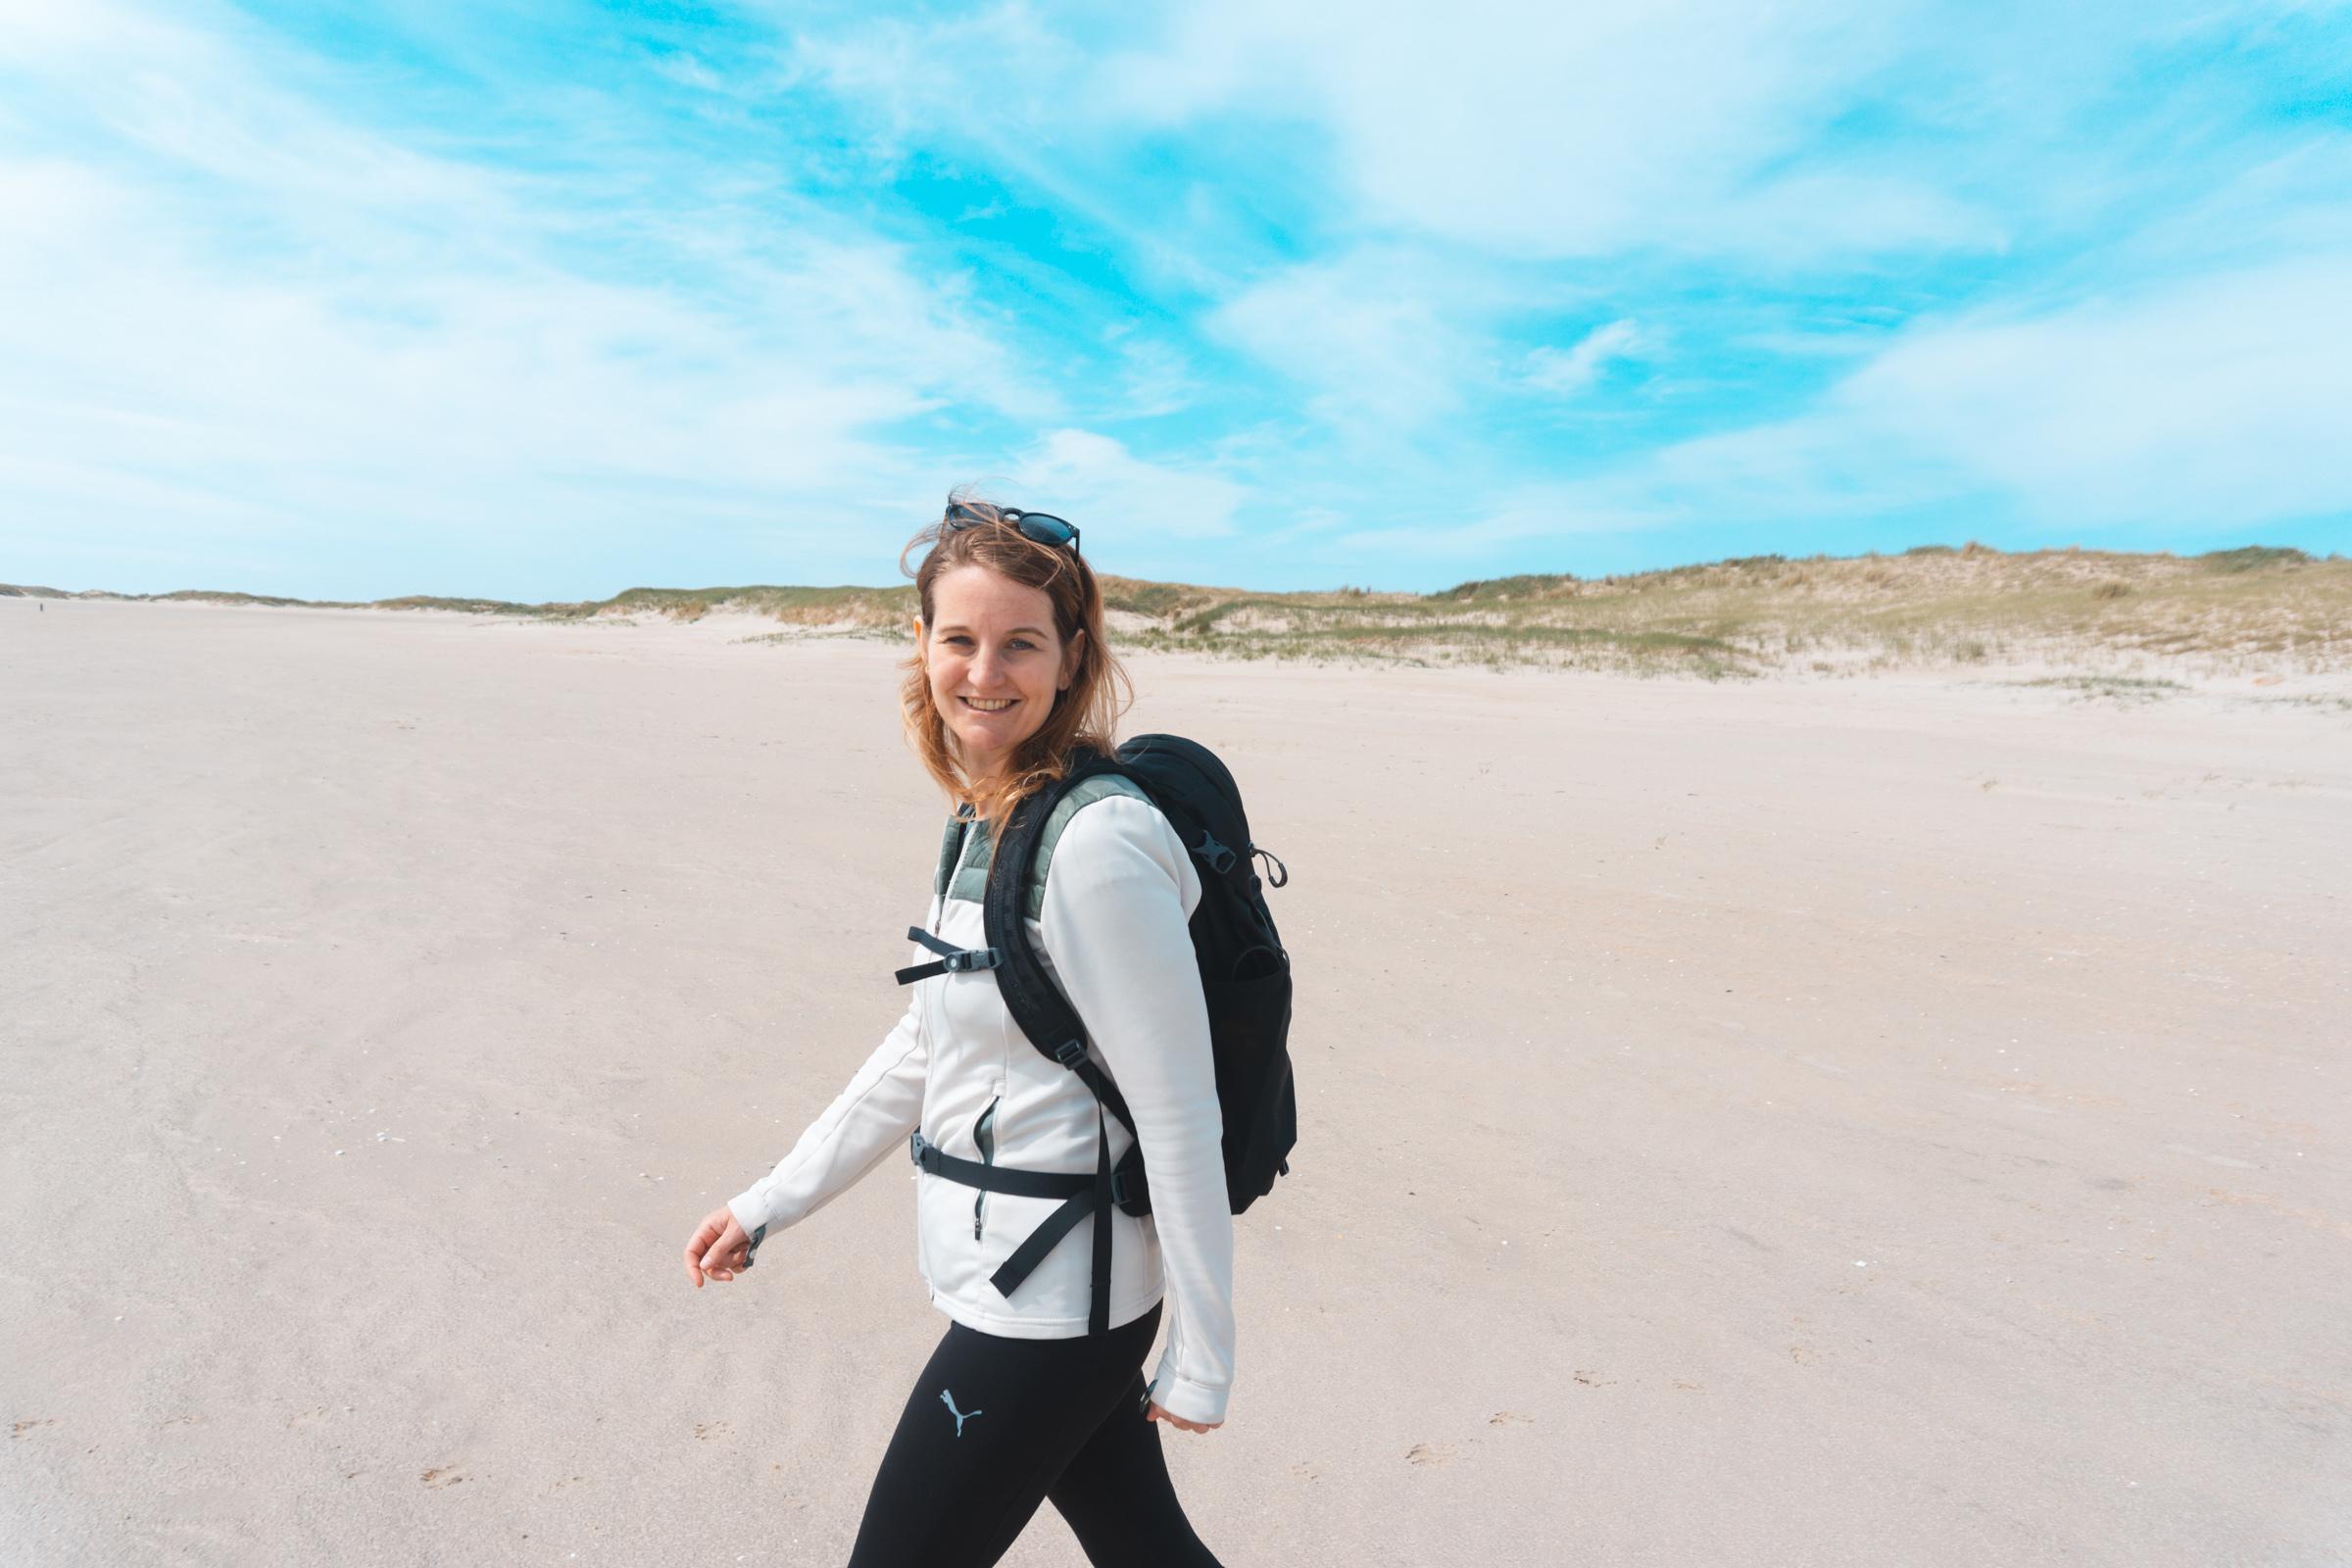 Wandelen op het strand VVV Texel fotograaf Kaz Paul van The Hike